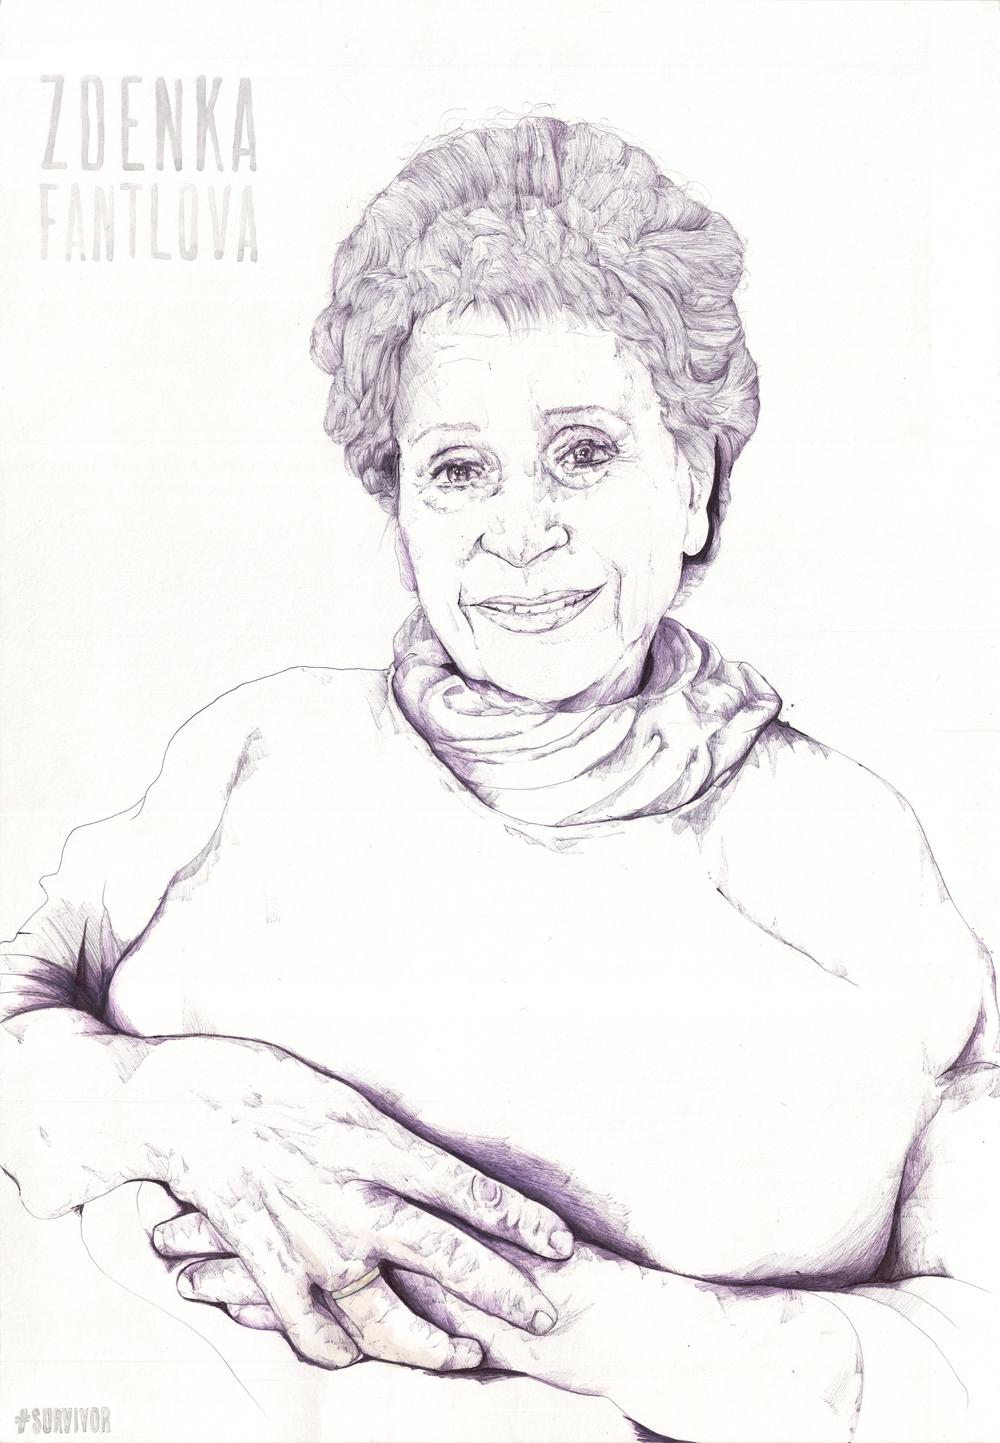 Zdenka Fantlova